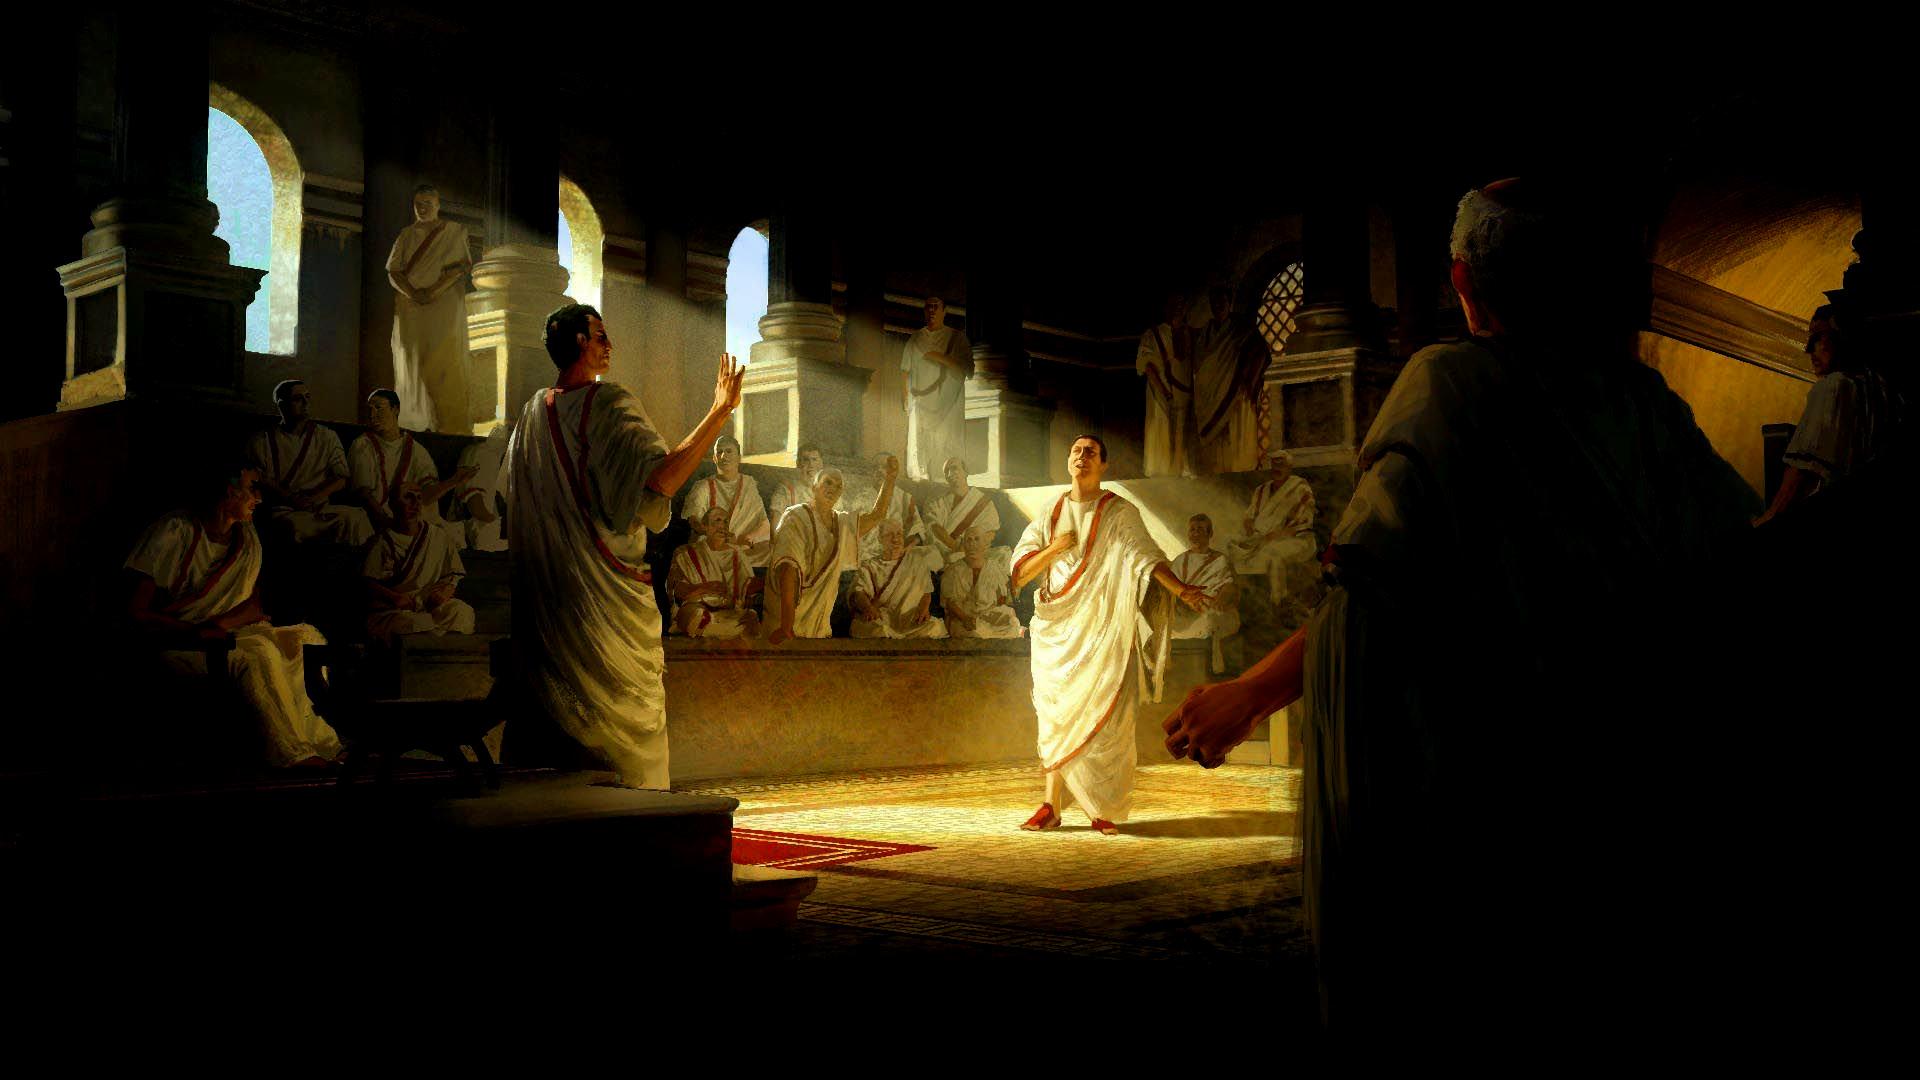 Senado del imperio romano